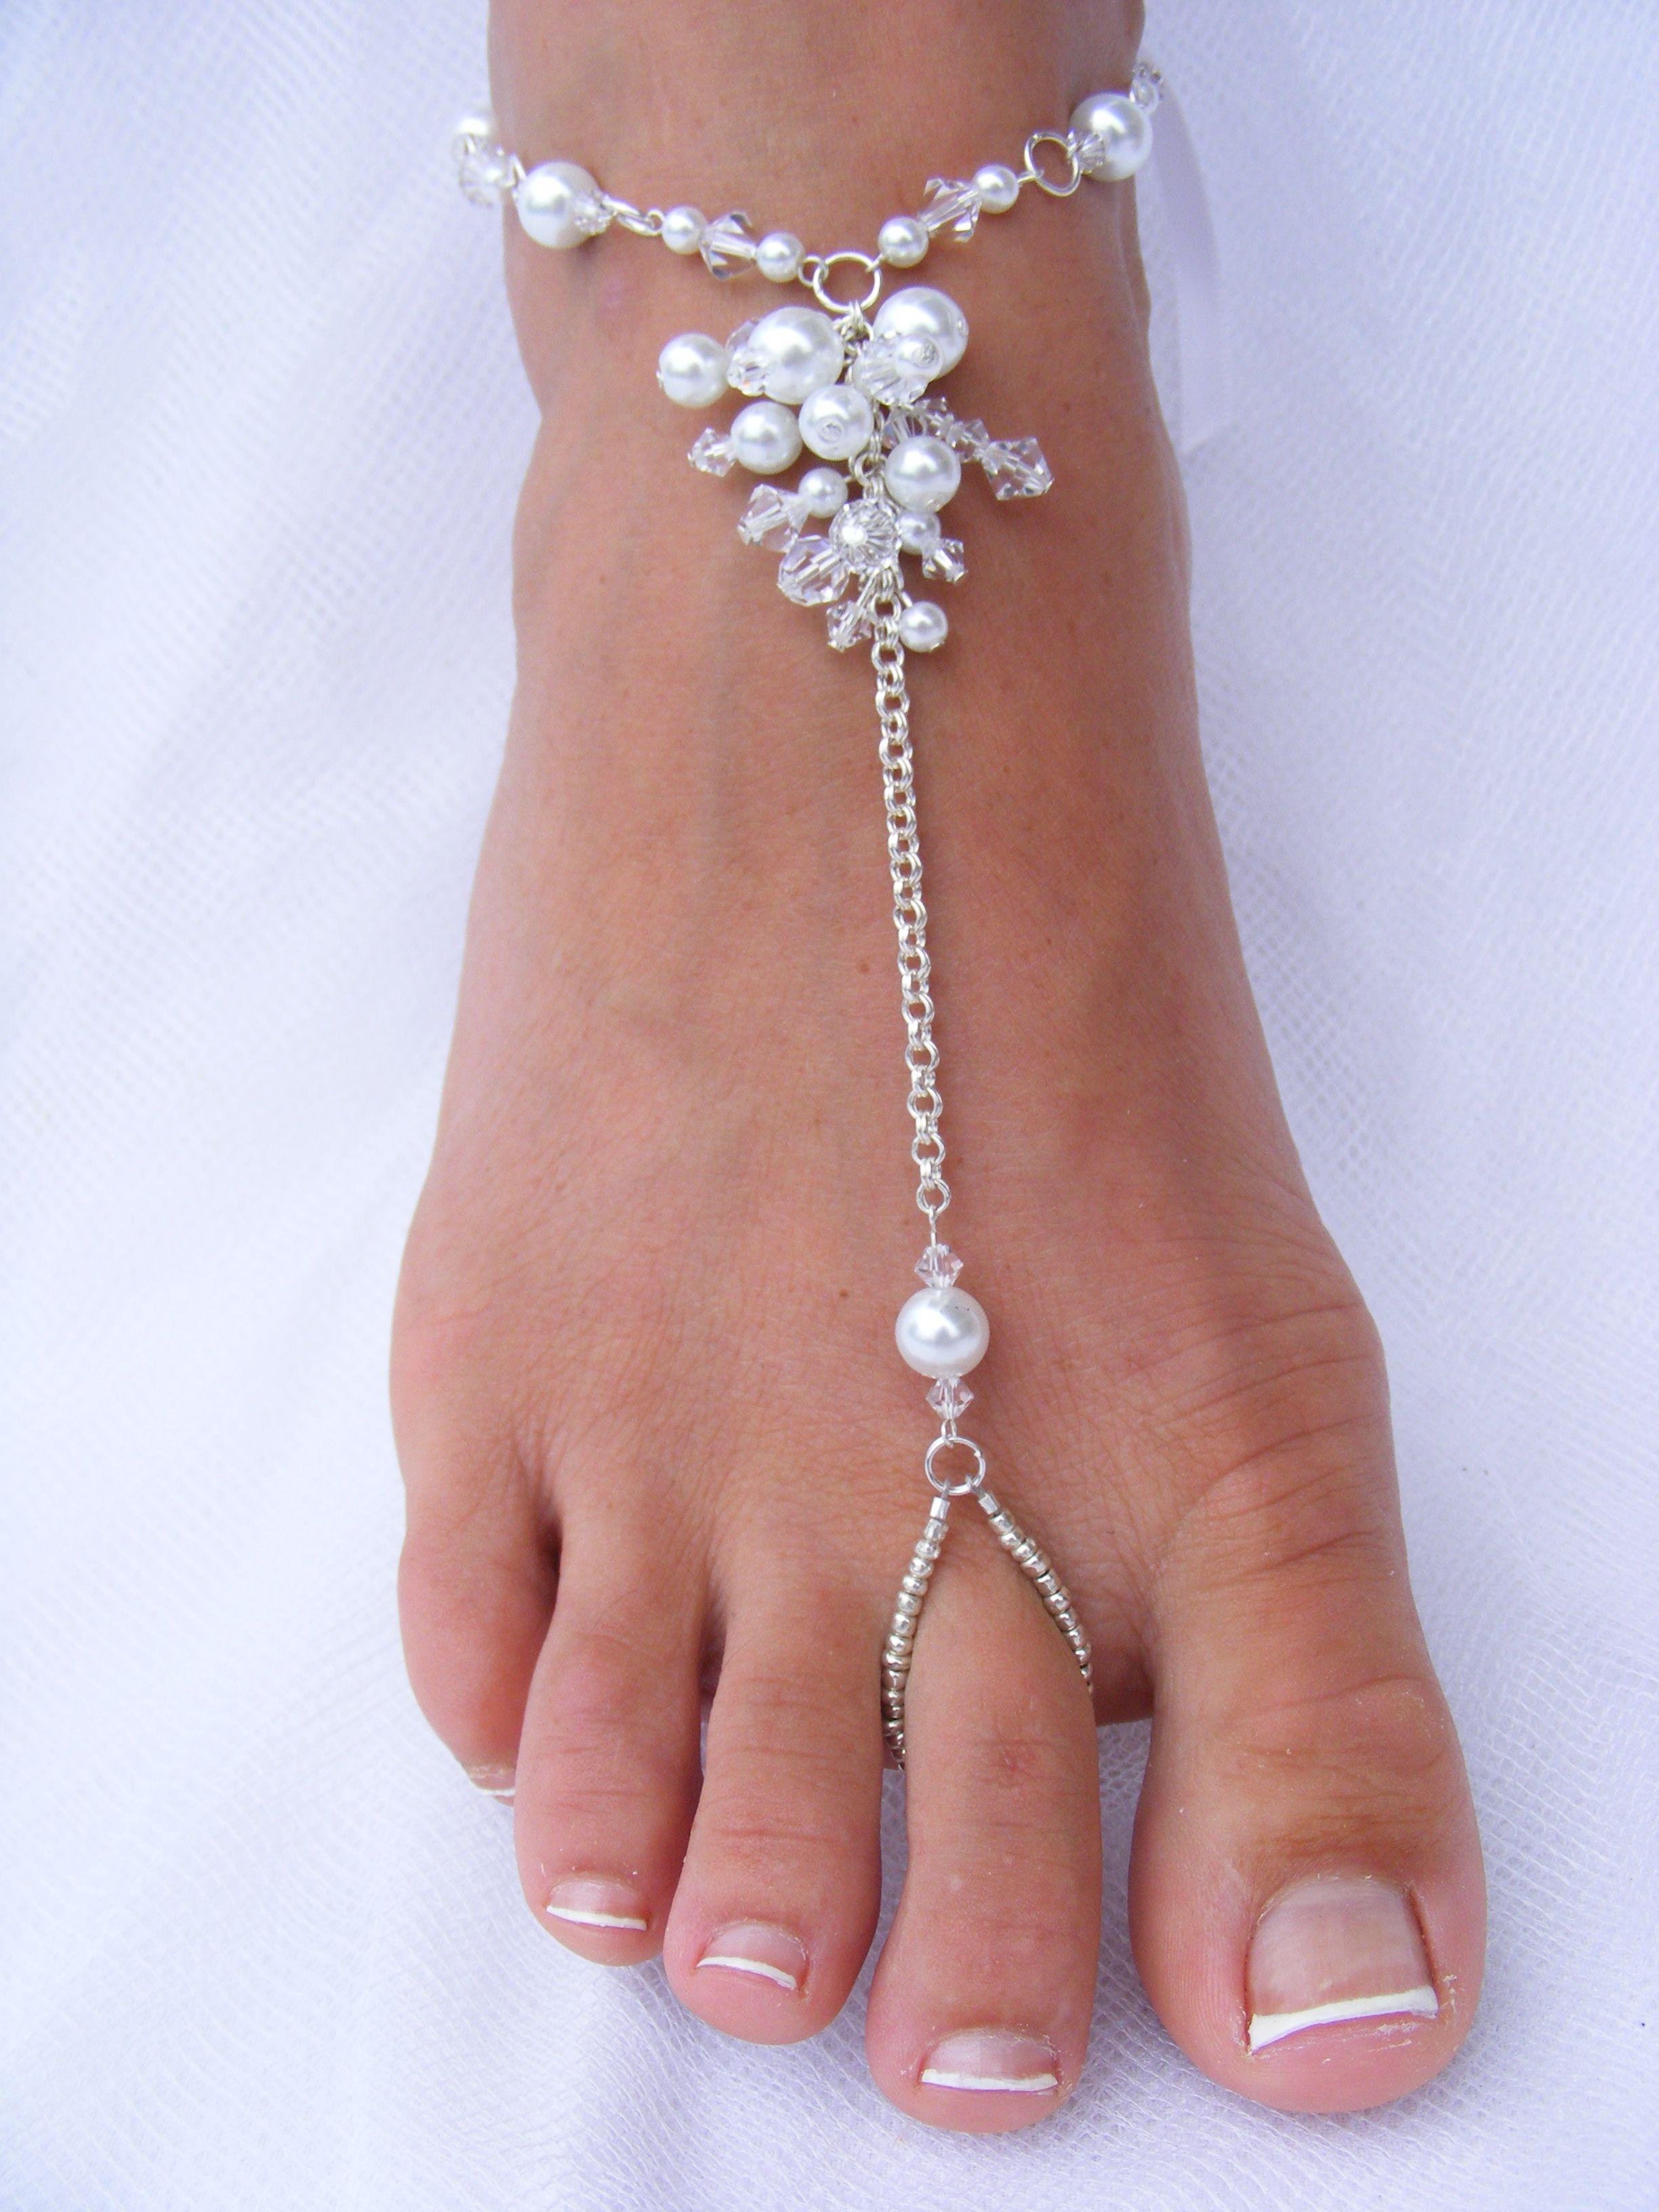 Barefoot Sandals Beach Wedding Bridal Jewelry